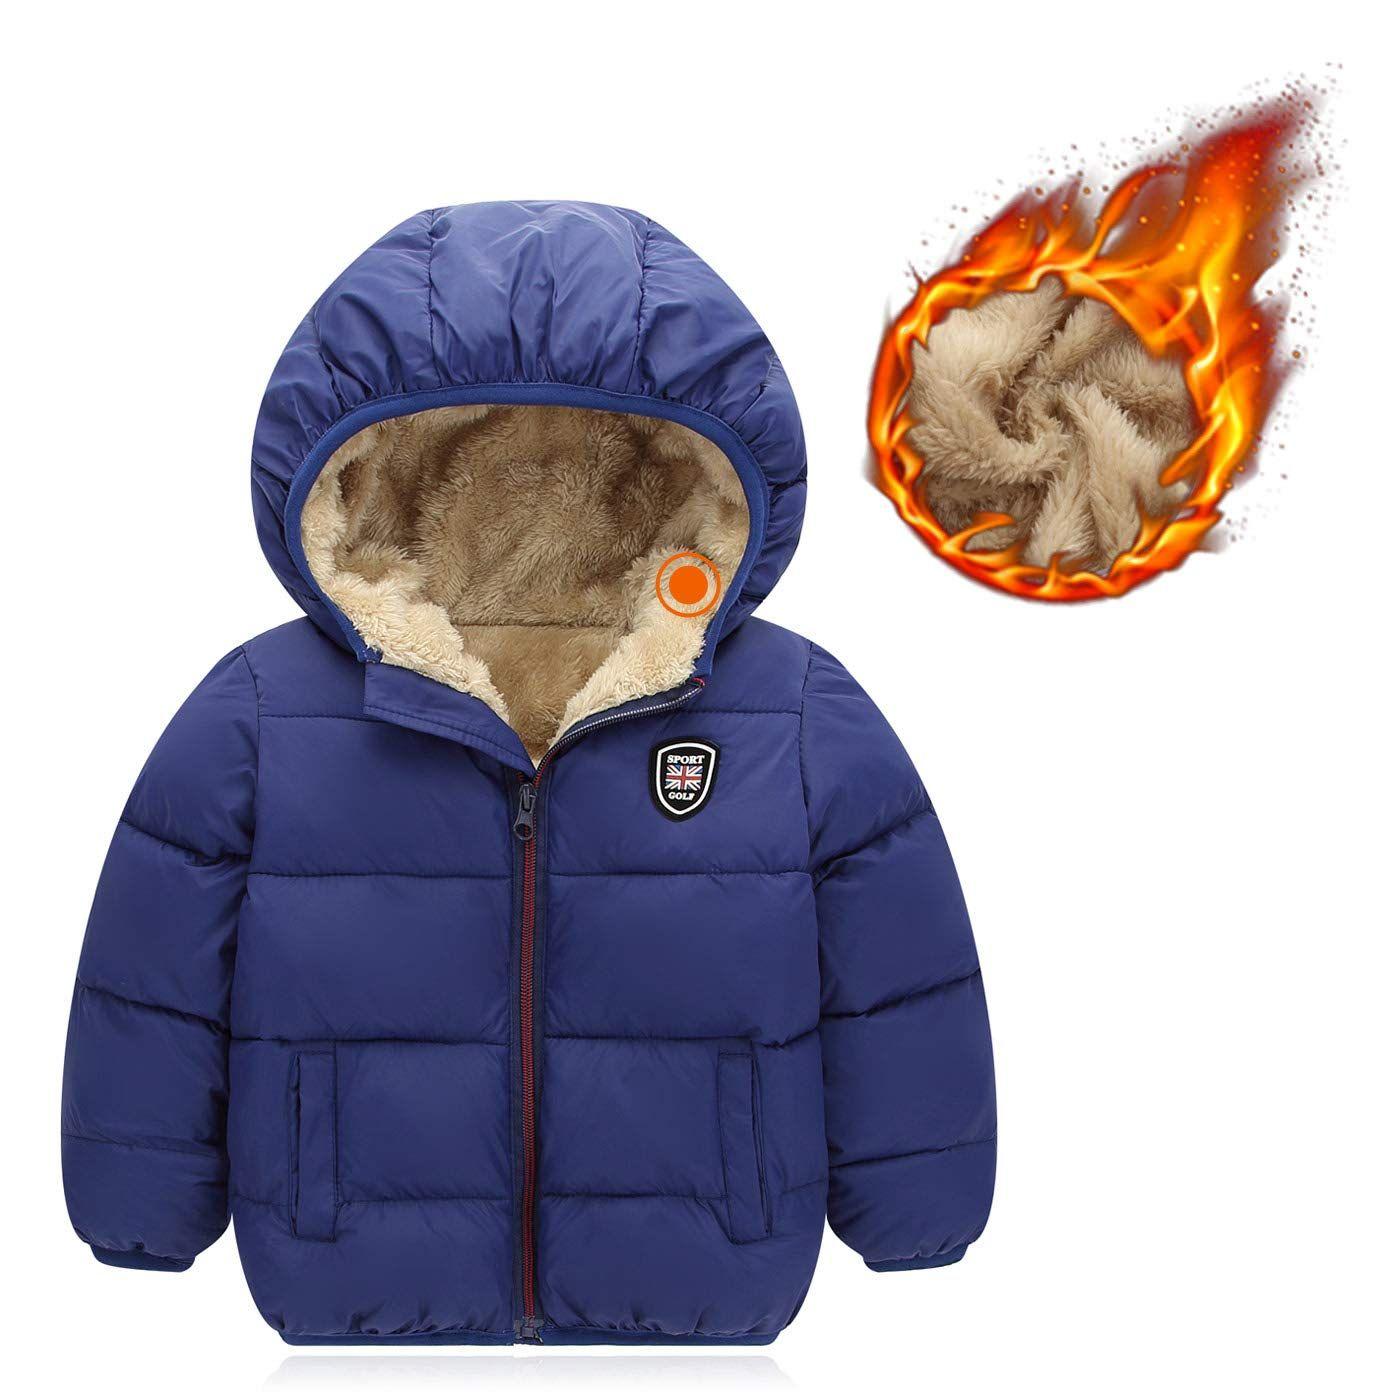 Baby Winter Fleece Coat Jacket,Baby Boys Girls Fleece Windproof Winter Coat Thicken Warm Outwear